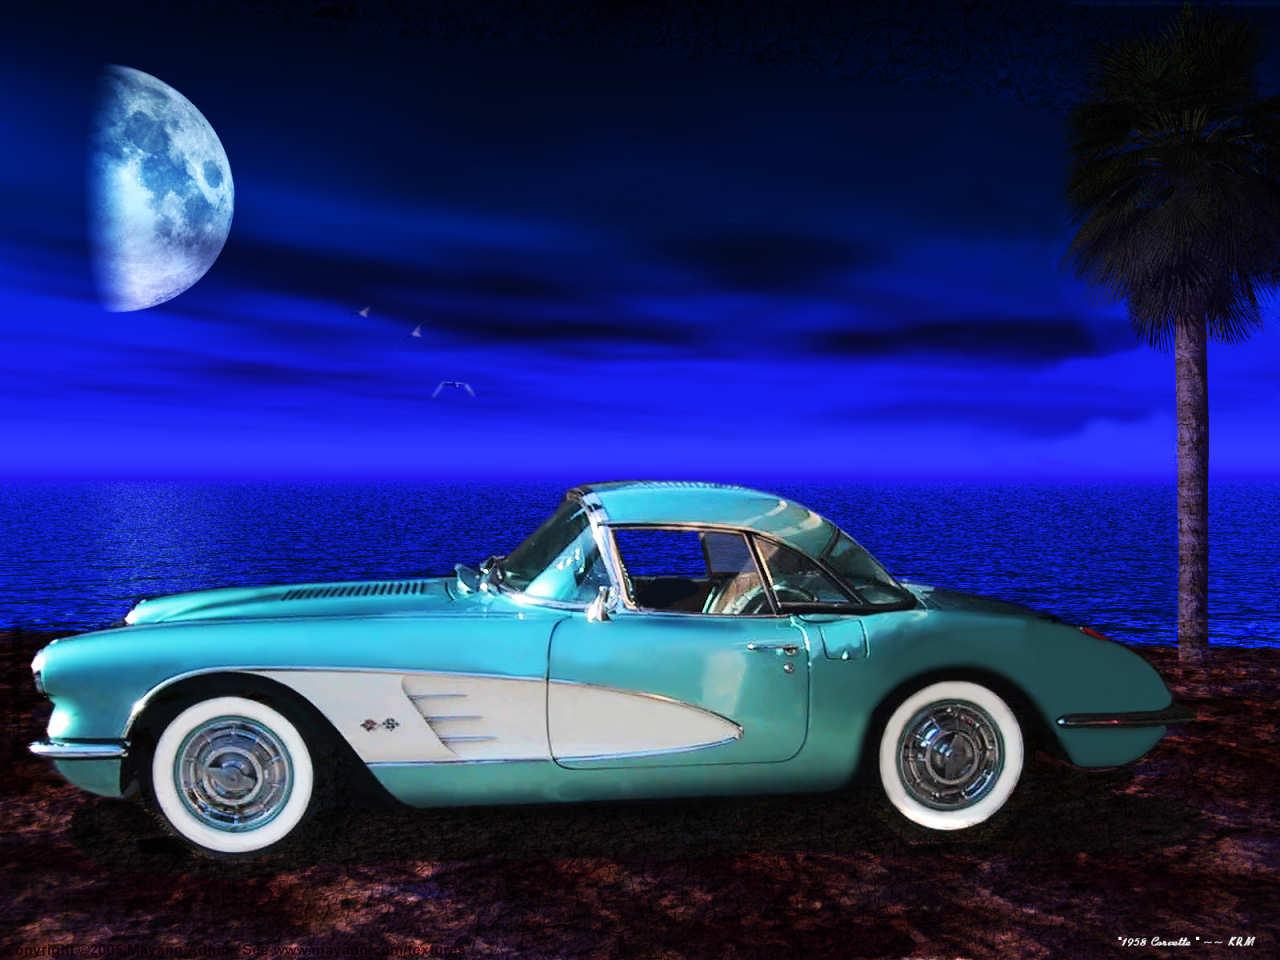 Click image for larger version  Name:AM_21 1958 Corvette=KRM.jpg Views:229 Size:113.5 KB ID:21532